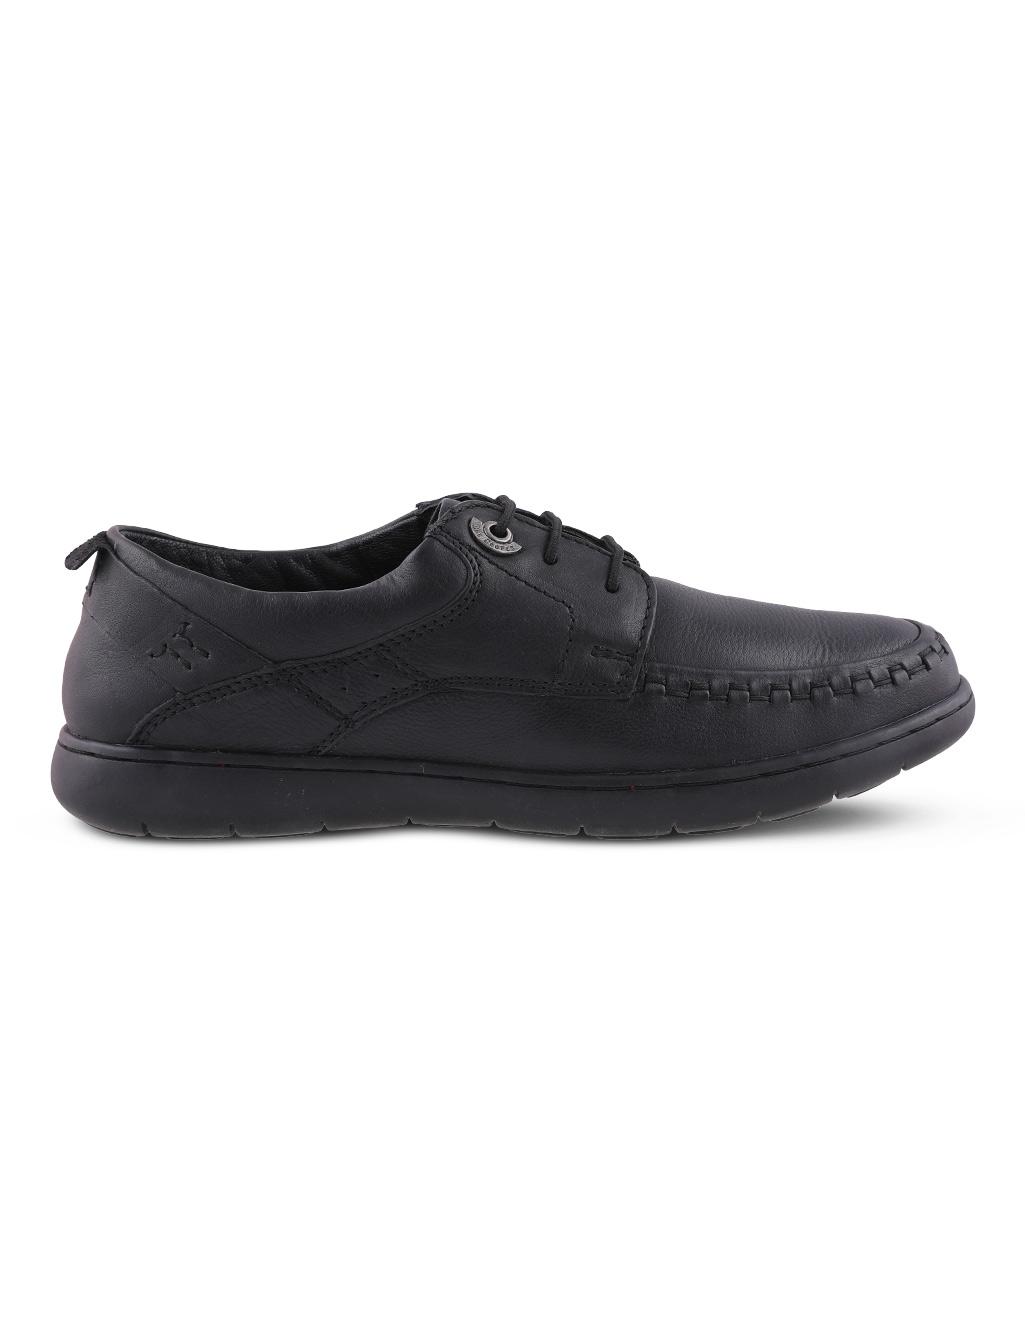 3601310f2 Lee Cooper Men s Black Semi Formal Shoes - Buy Online at Best Prices ...